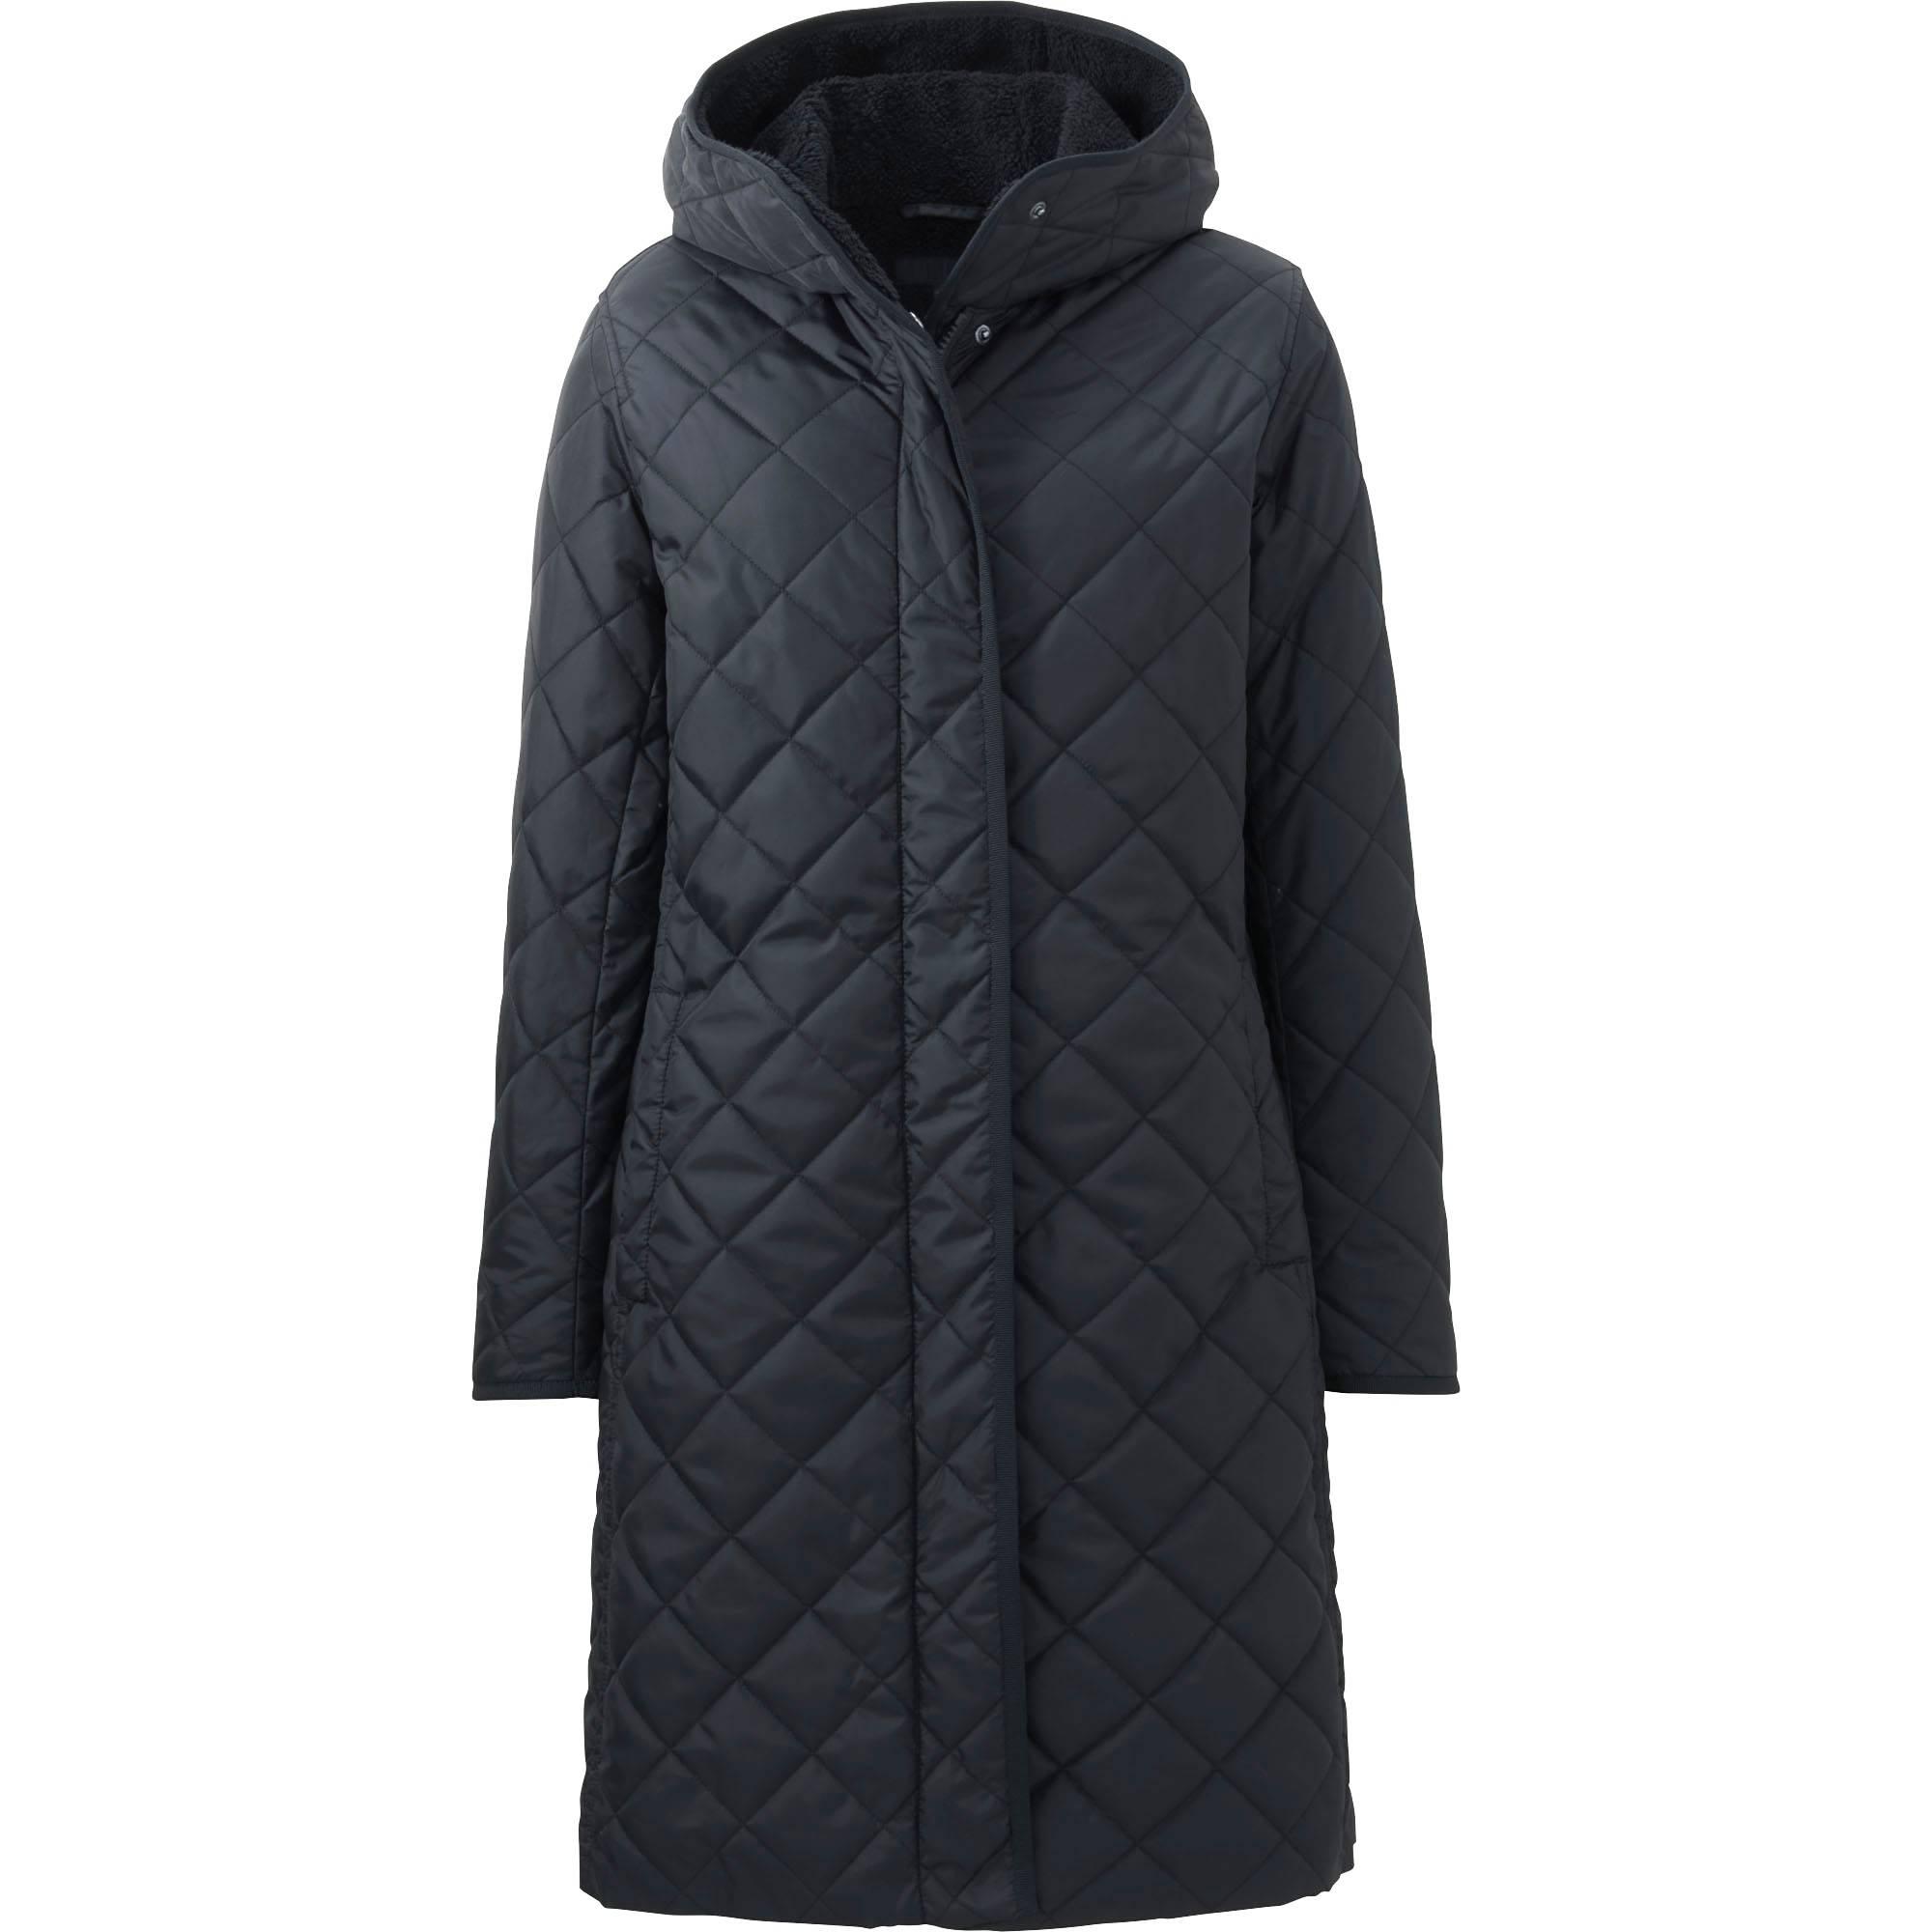 WOMEN WARM PADDED COAT | UNIQLO US : uniqlo quilted jacket - Adamdwight.com